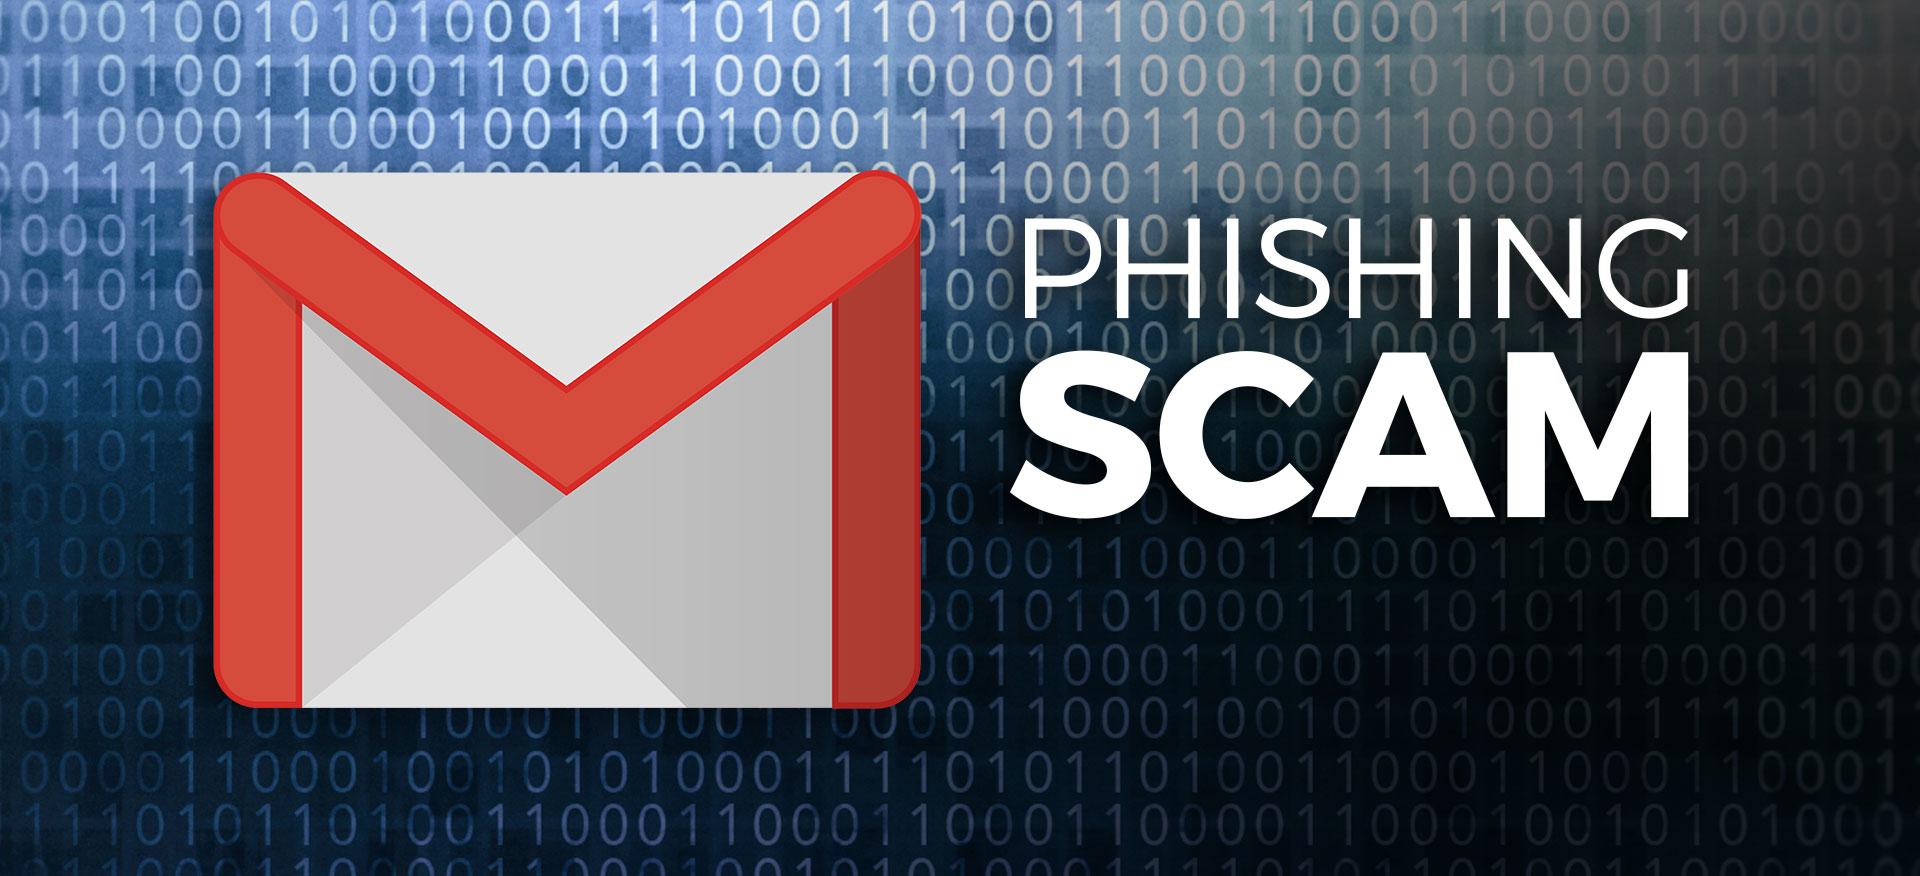 Canale Sicurezza - Phishing Gmail